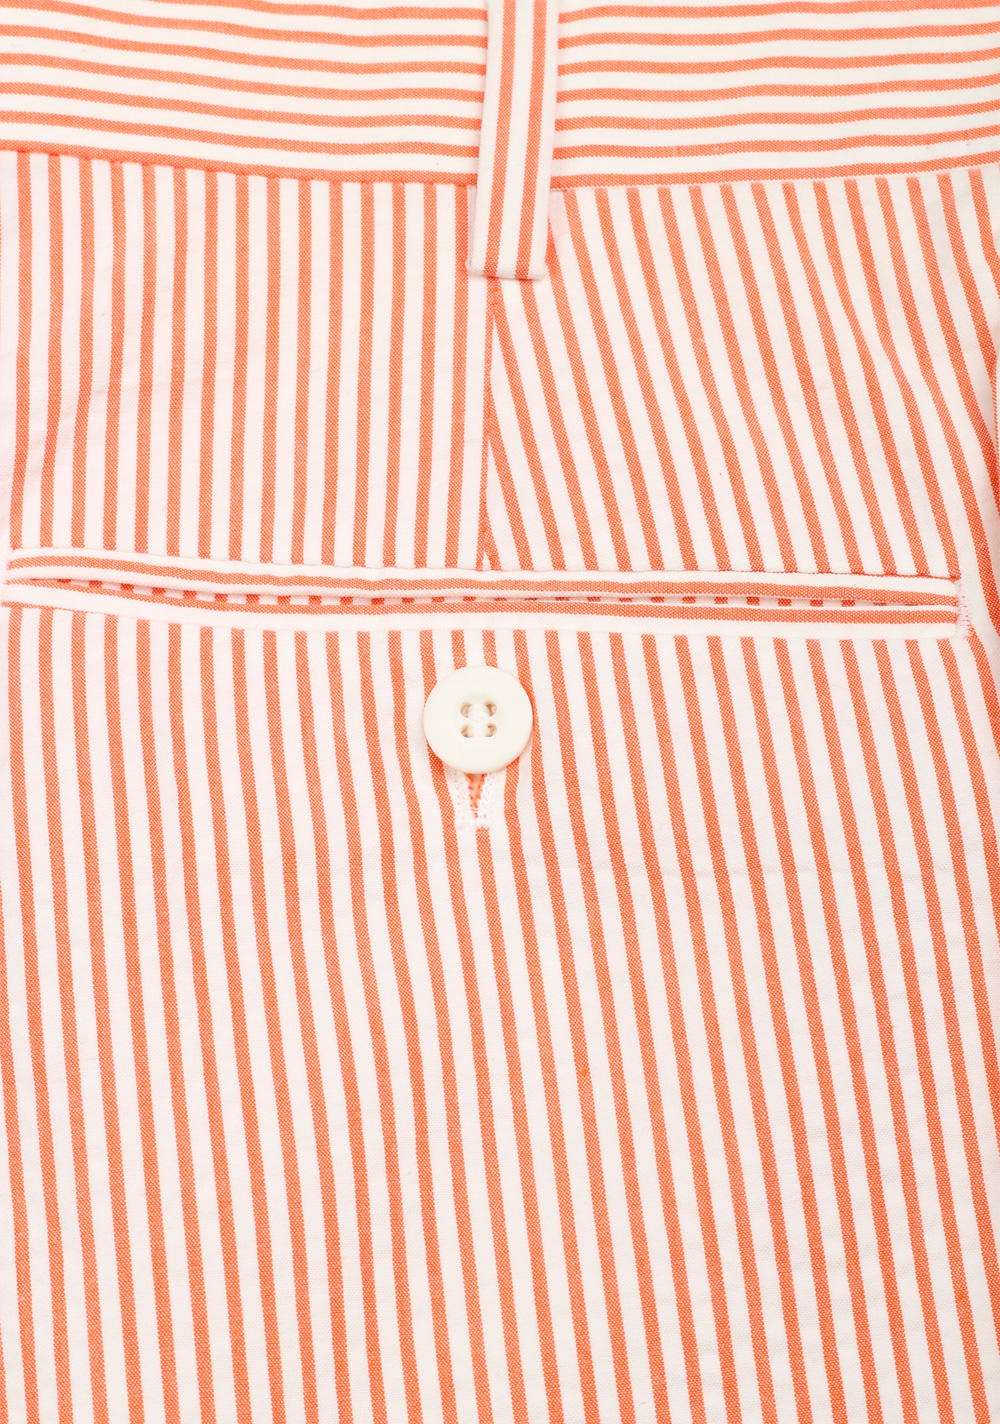 Brioni Pink White Striped Trousers Size 48 / 32 U.S. | Costume Limité